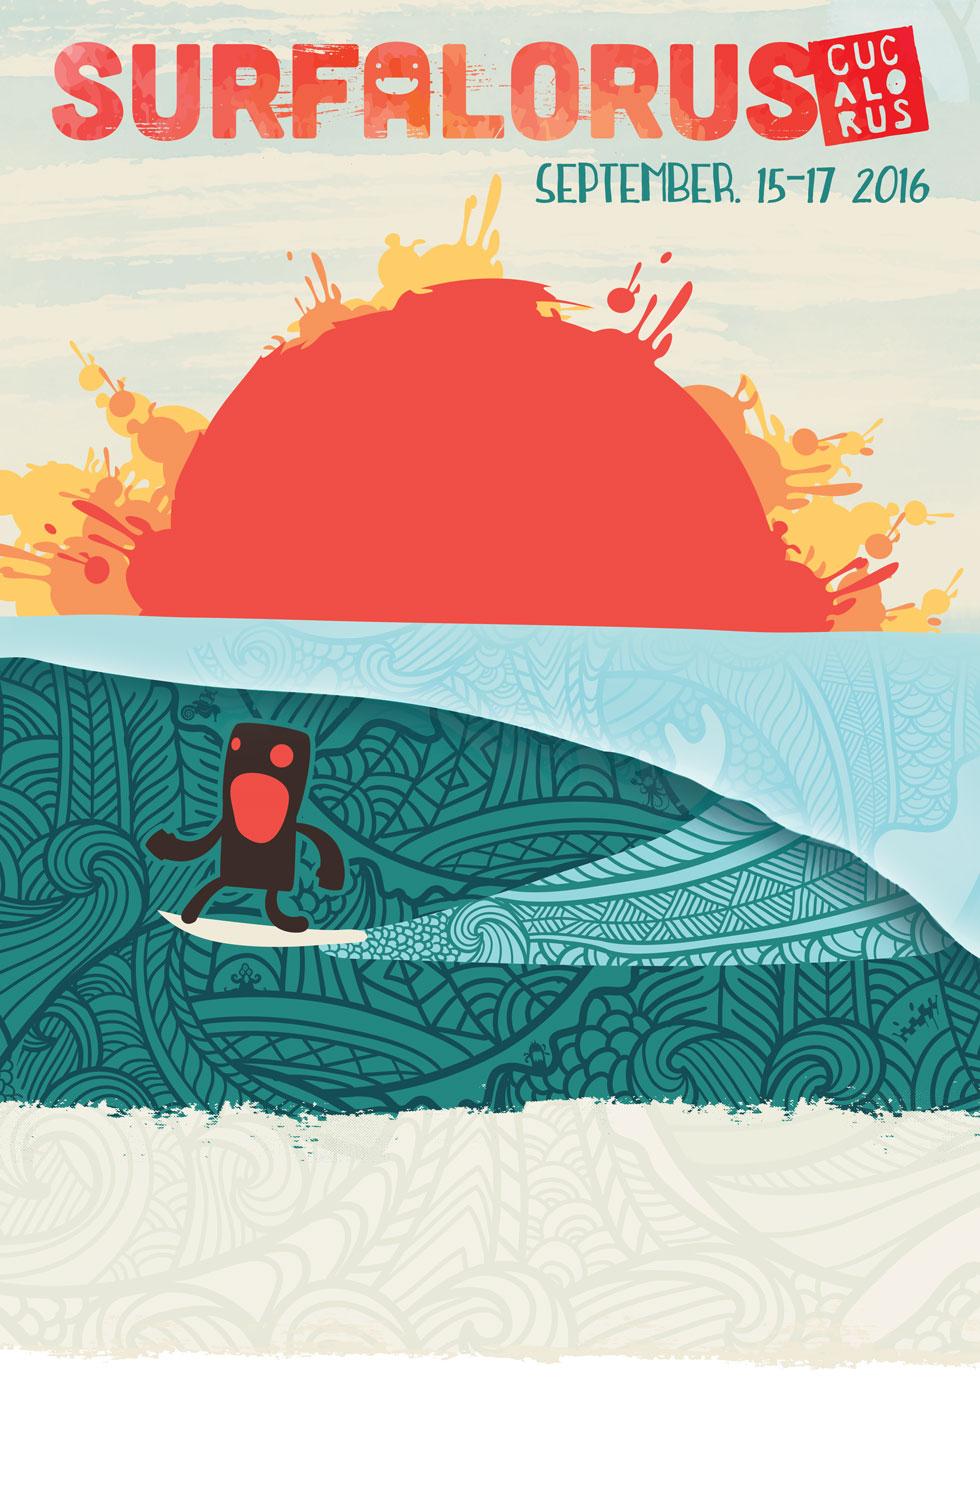 2016 Surfalorus Film Festival Poster Design